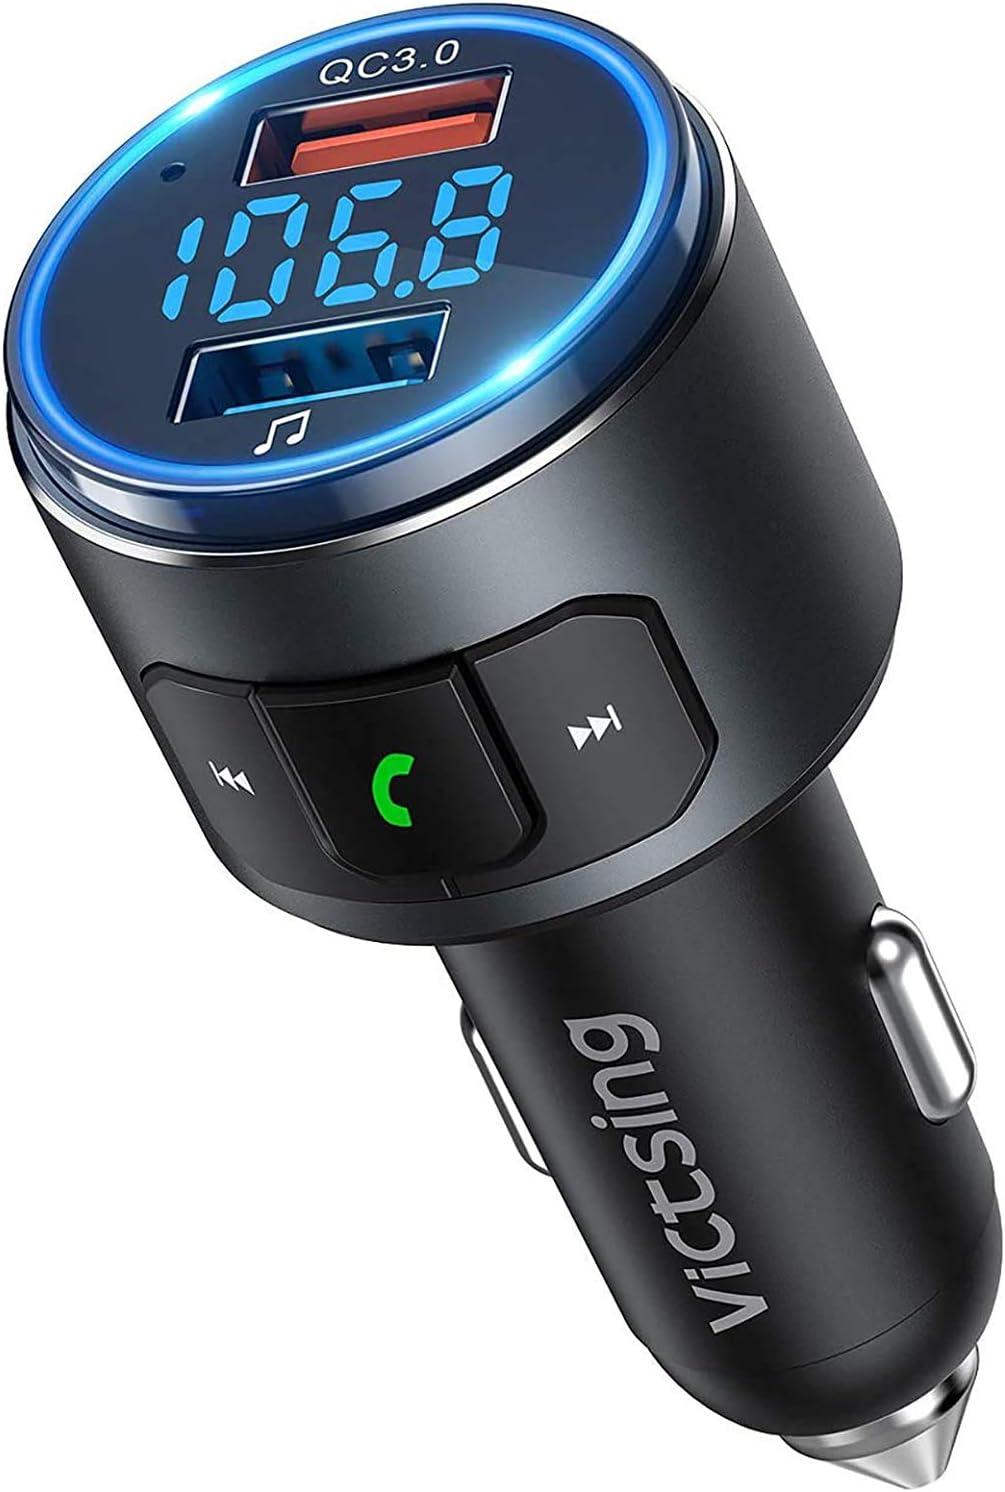 Transmisor FM Bluetooth 5.0 para Coche, [Luz LED Anillo] QC3.0 VicTsing Mini Transmisor Bluetooth Manos Libres con Siri Asistente, Reproductor MP3 ...